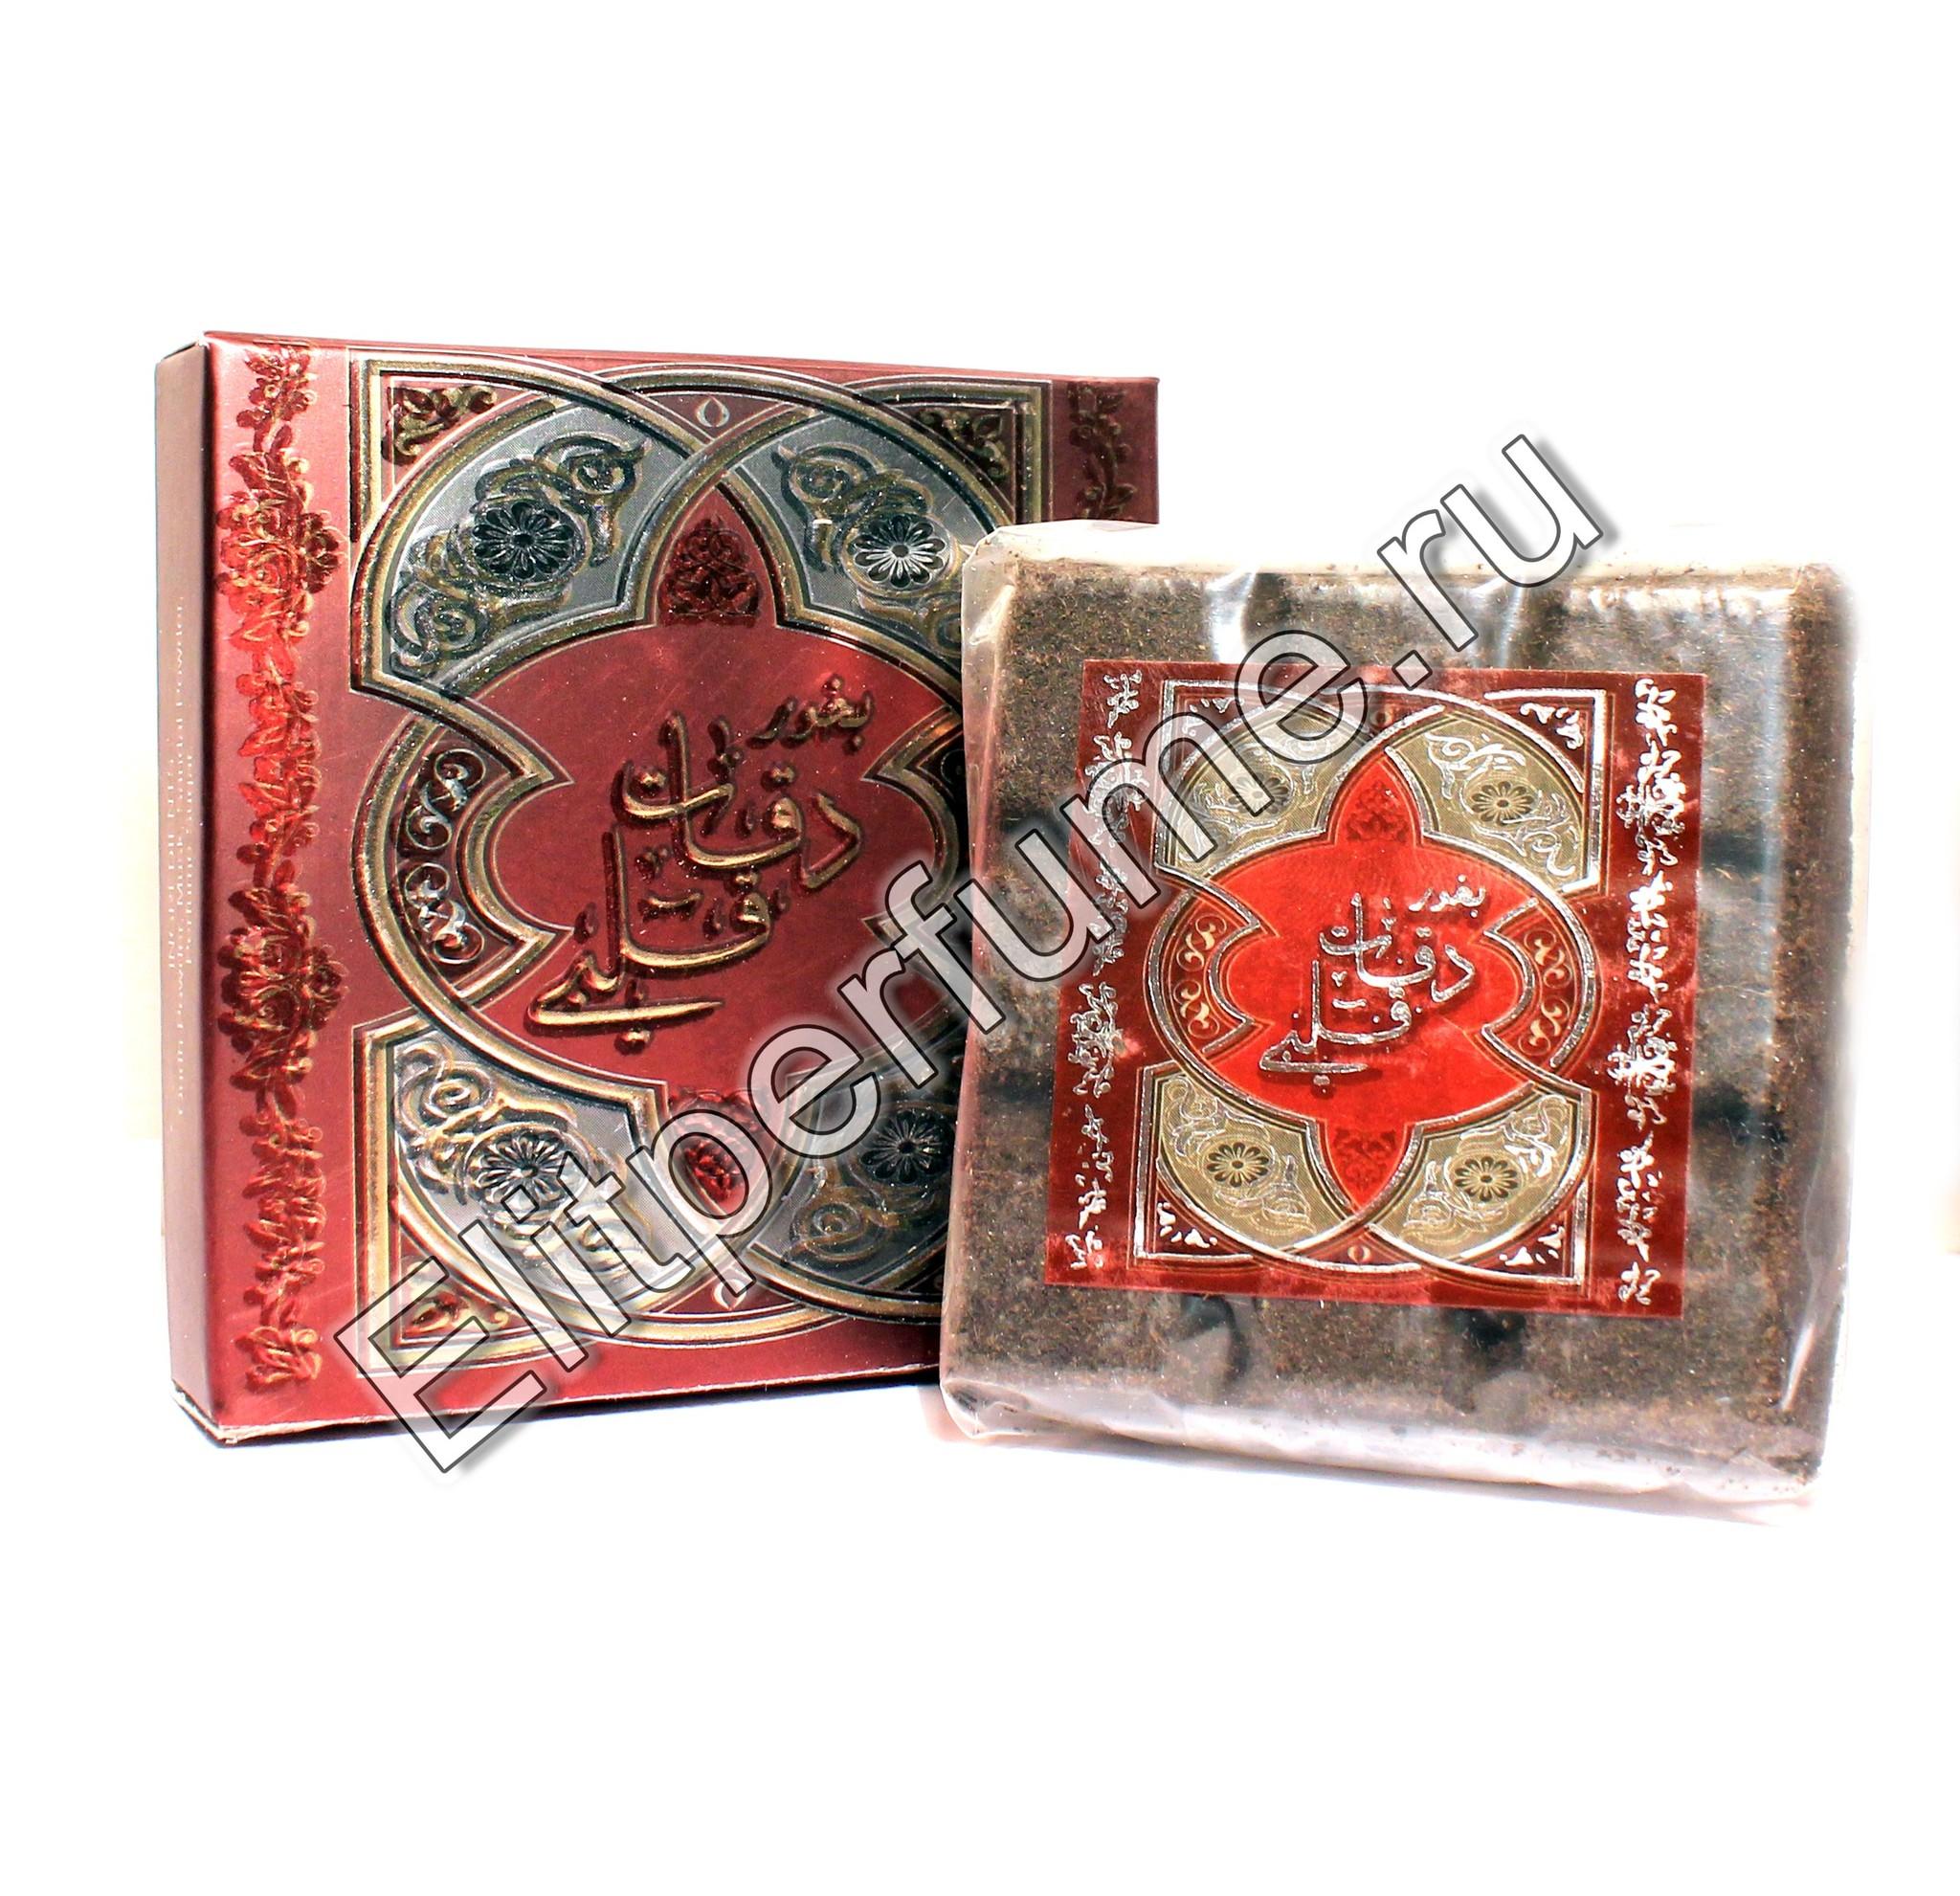 Bakhoor Daqaat Qalbi Бахур Дакаат Кэлбай 40 гр. аромосмесь от Ард Аль Заафаран Ard Al Zaafaran